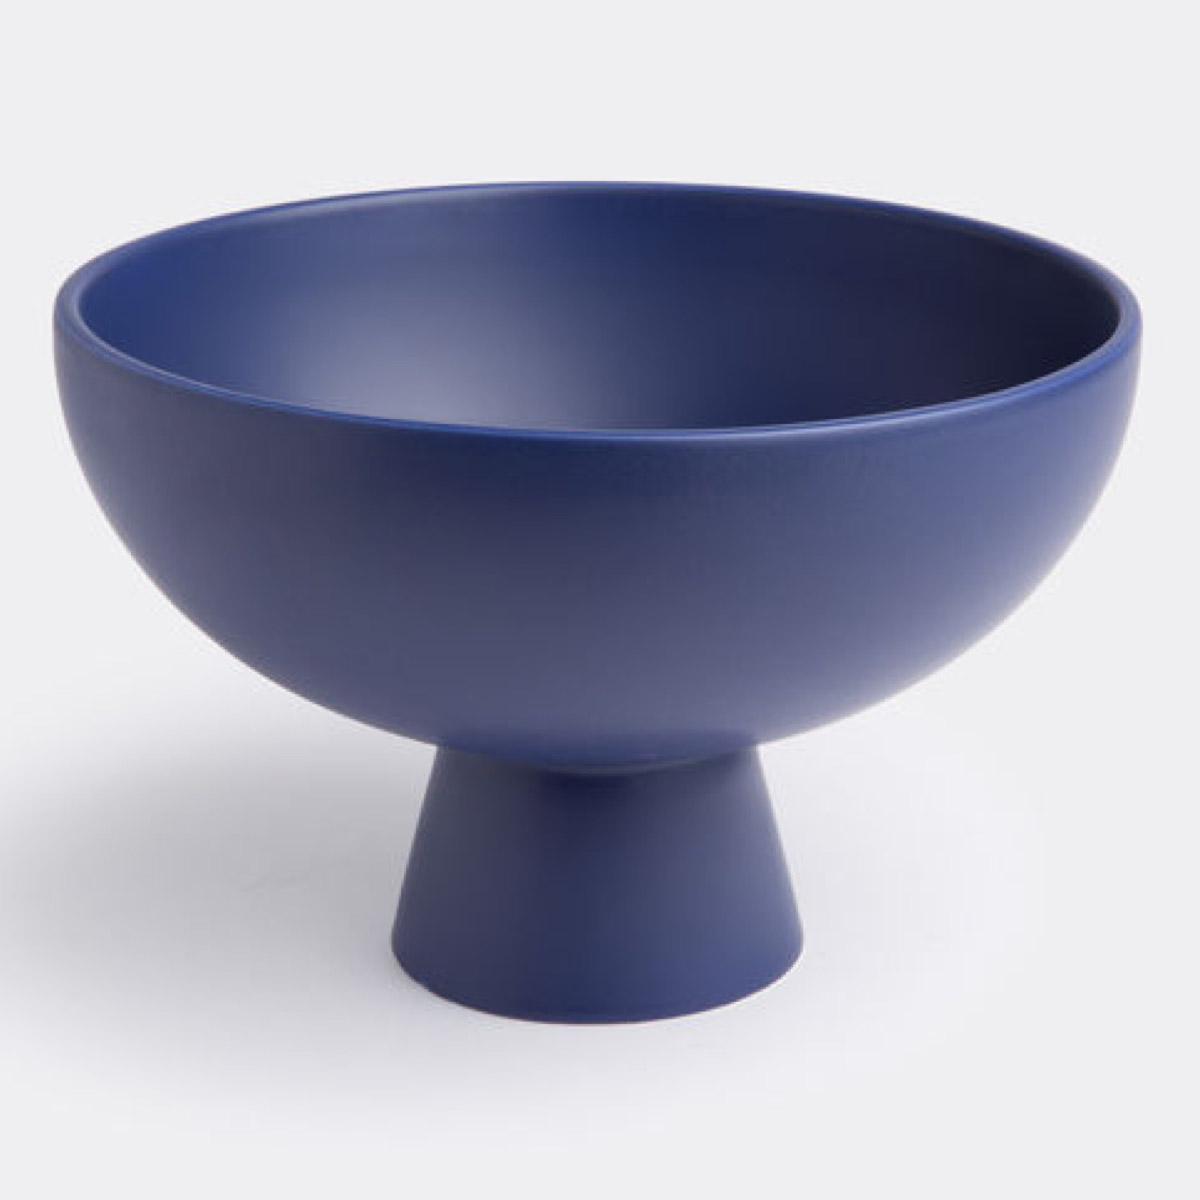 Strom big bowl